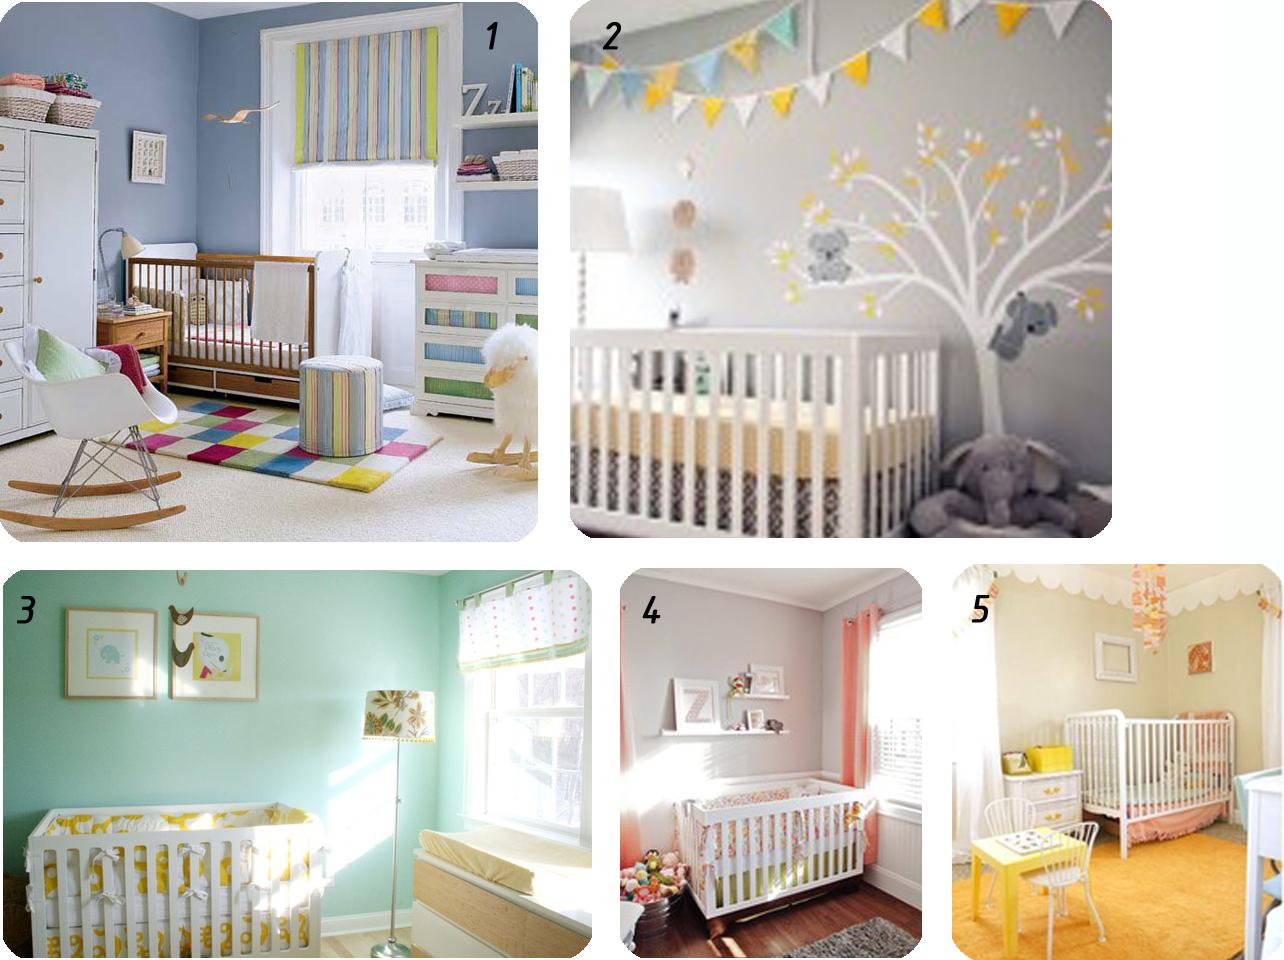 Colori Da Parete Per Camerette colori per pareti camerette